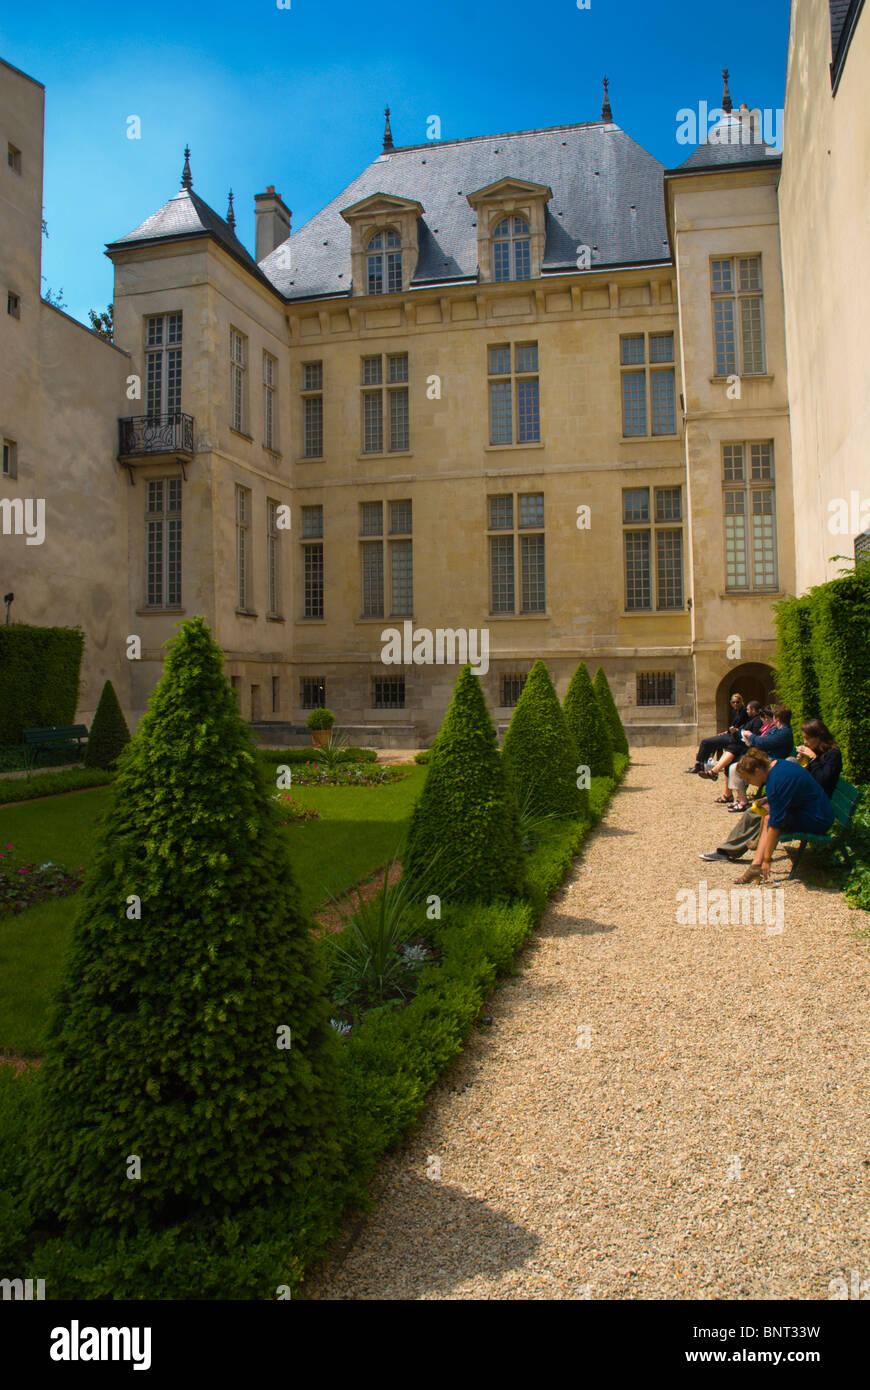 Jardin de Hotel Donon garden Le Marais district central Paris France Europe - Stock Image